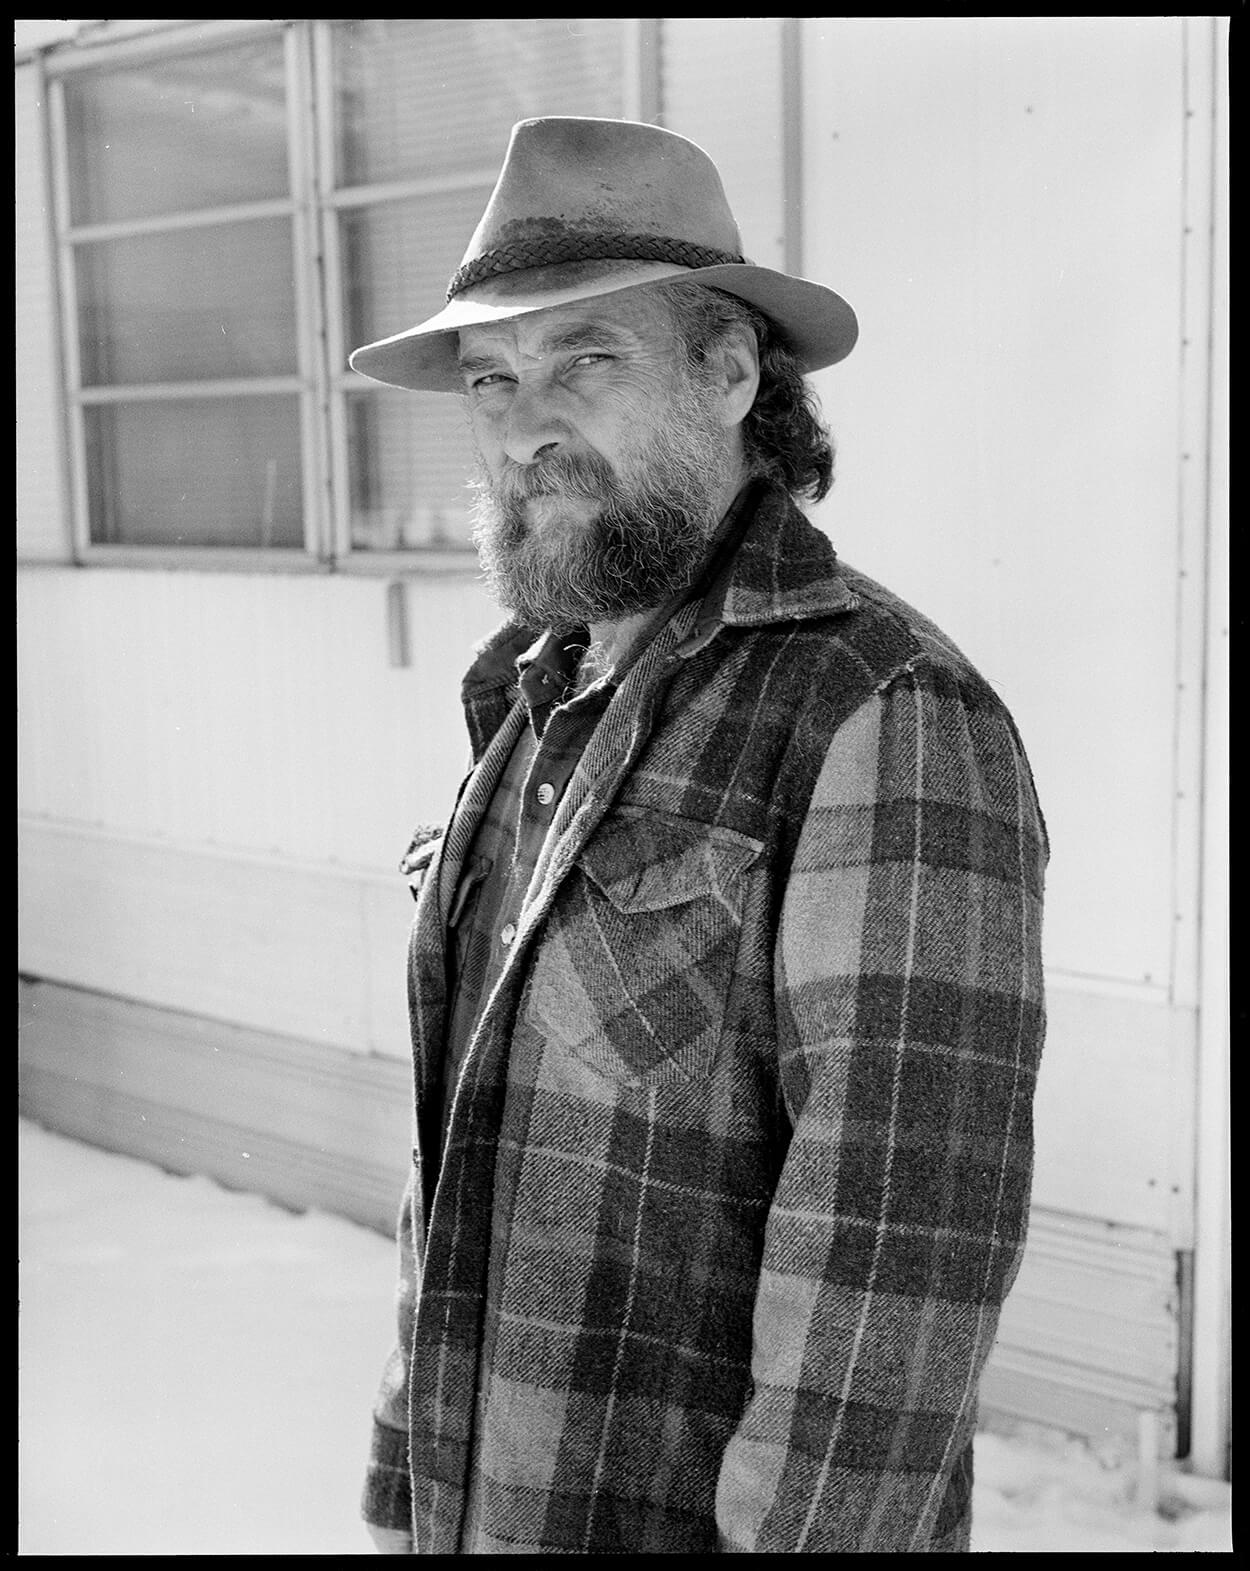 LARRY - Redneck Roundup - Hunter Barnes Photography